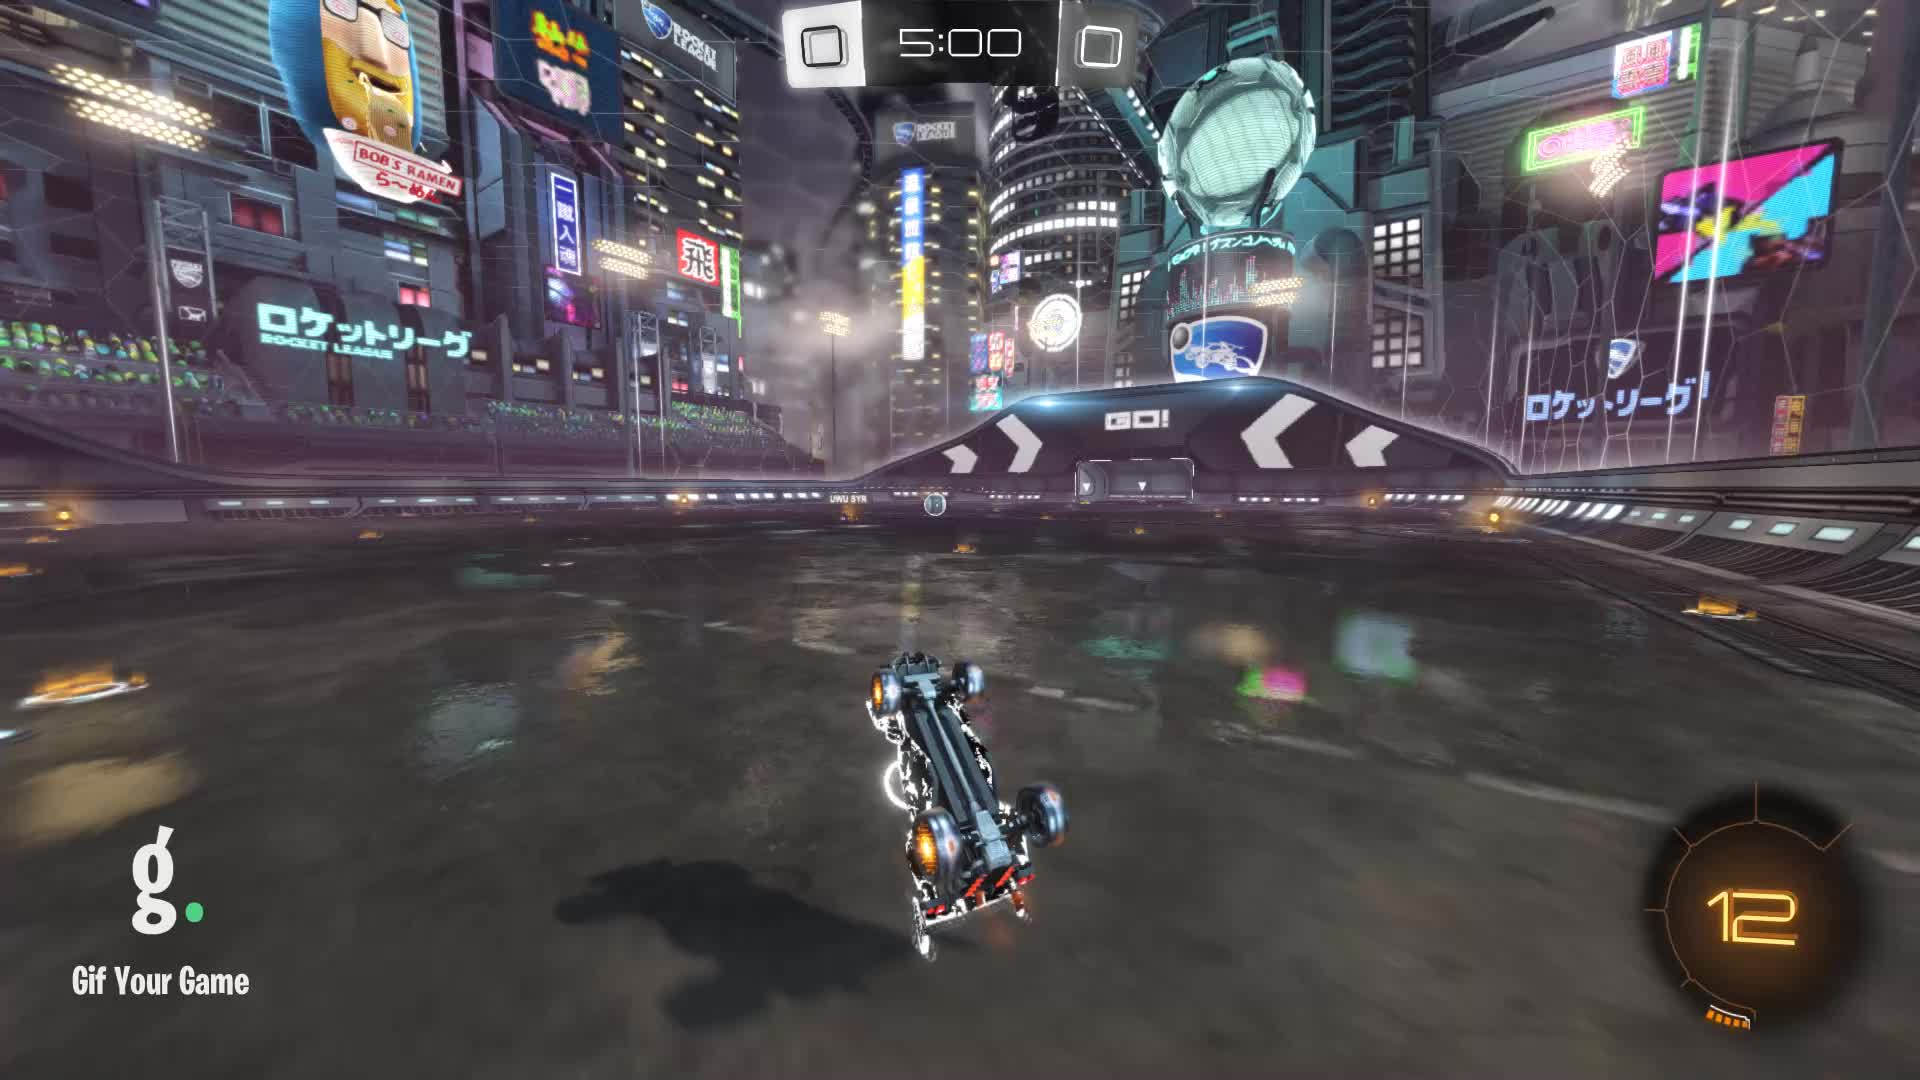 Gif Your Game, GifYourGame, Goal, Rocket League, RocketLeague, Zoar, Goal 1: Zoar GIFs